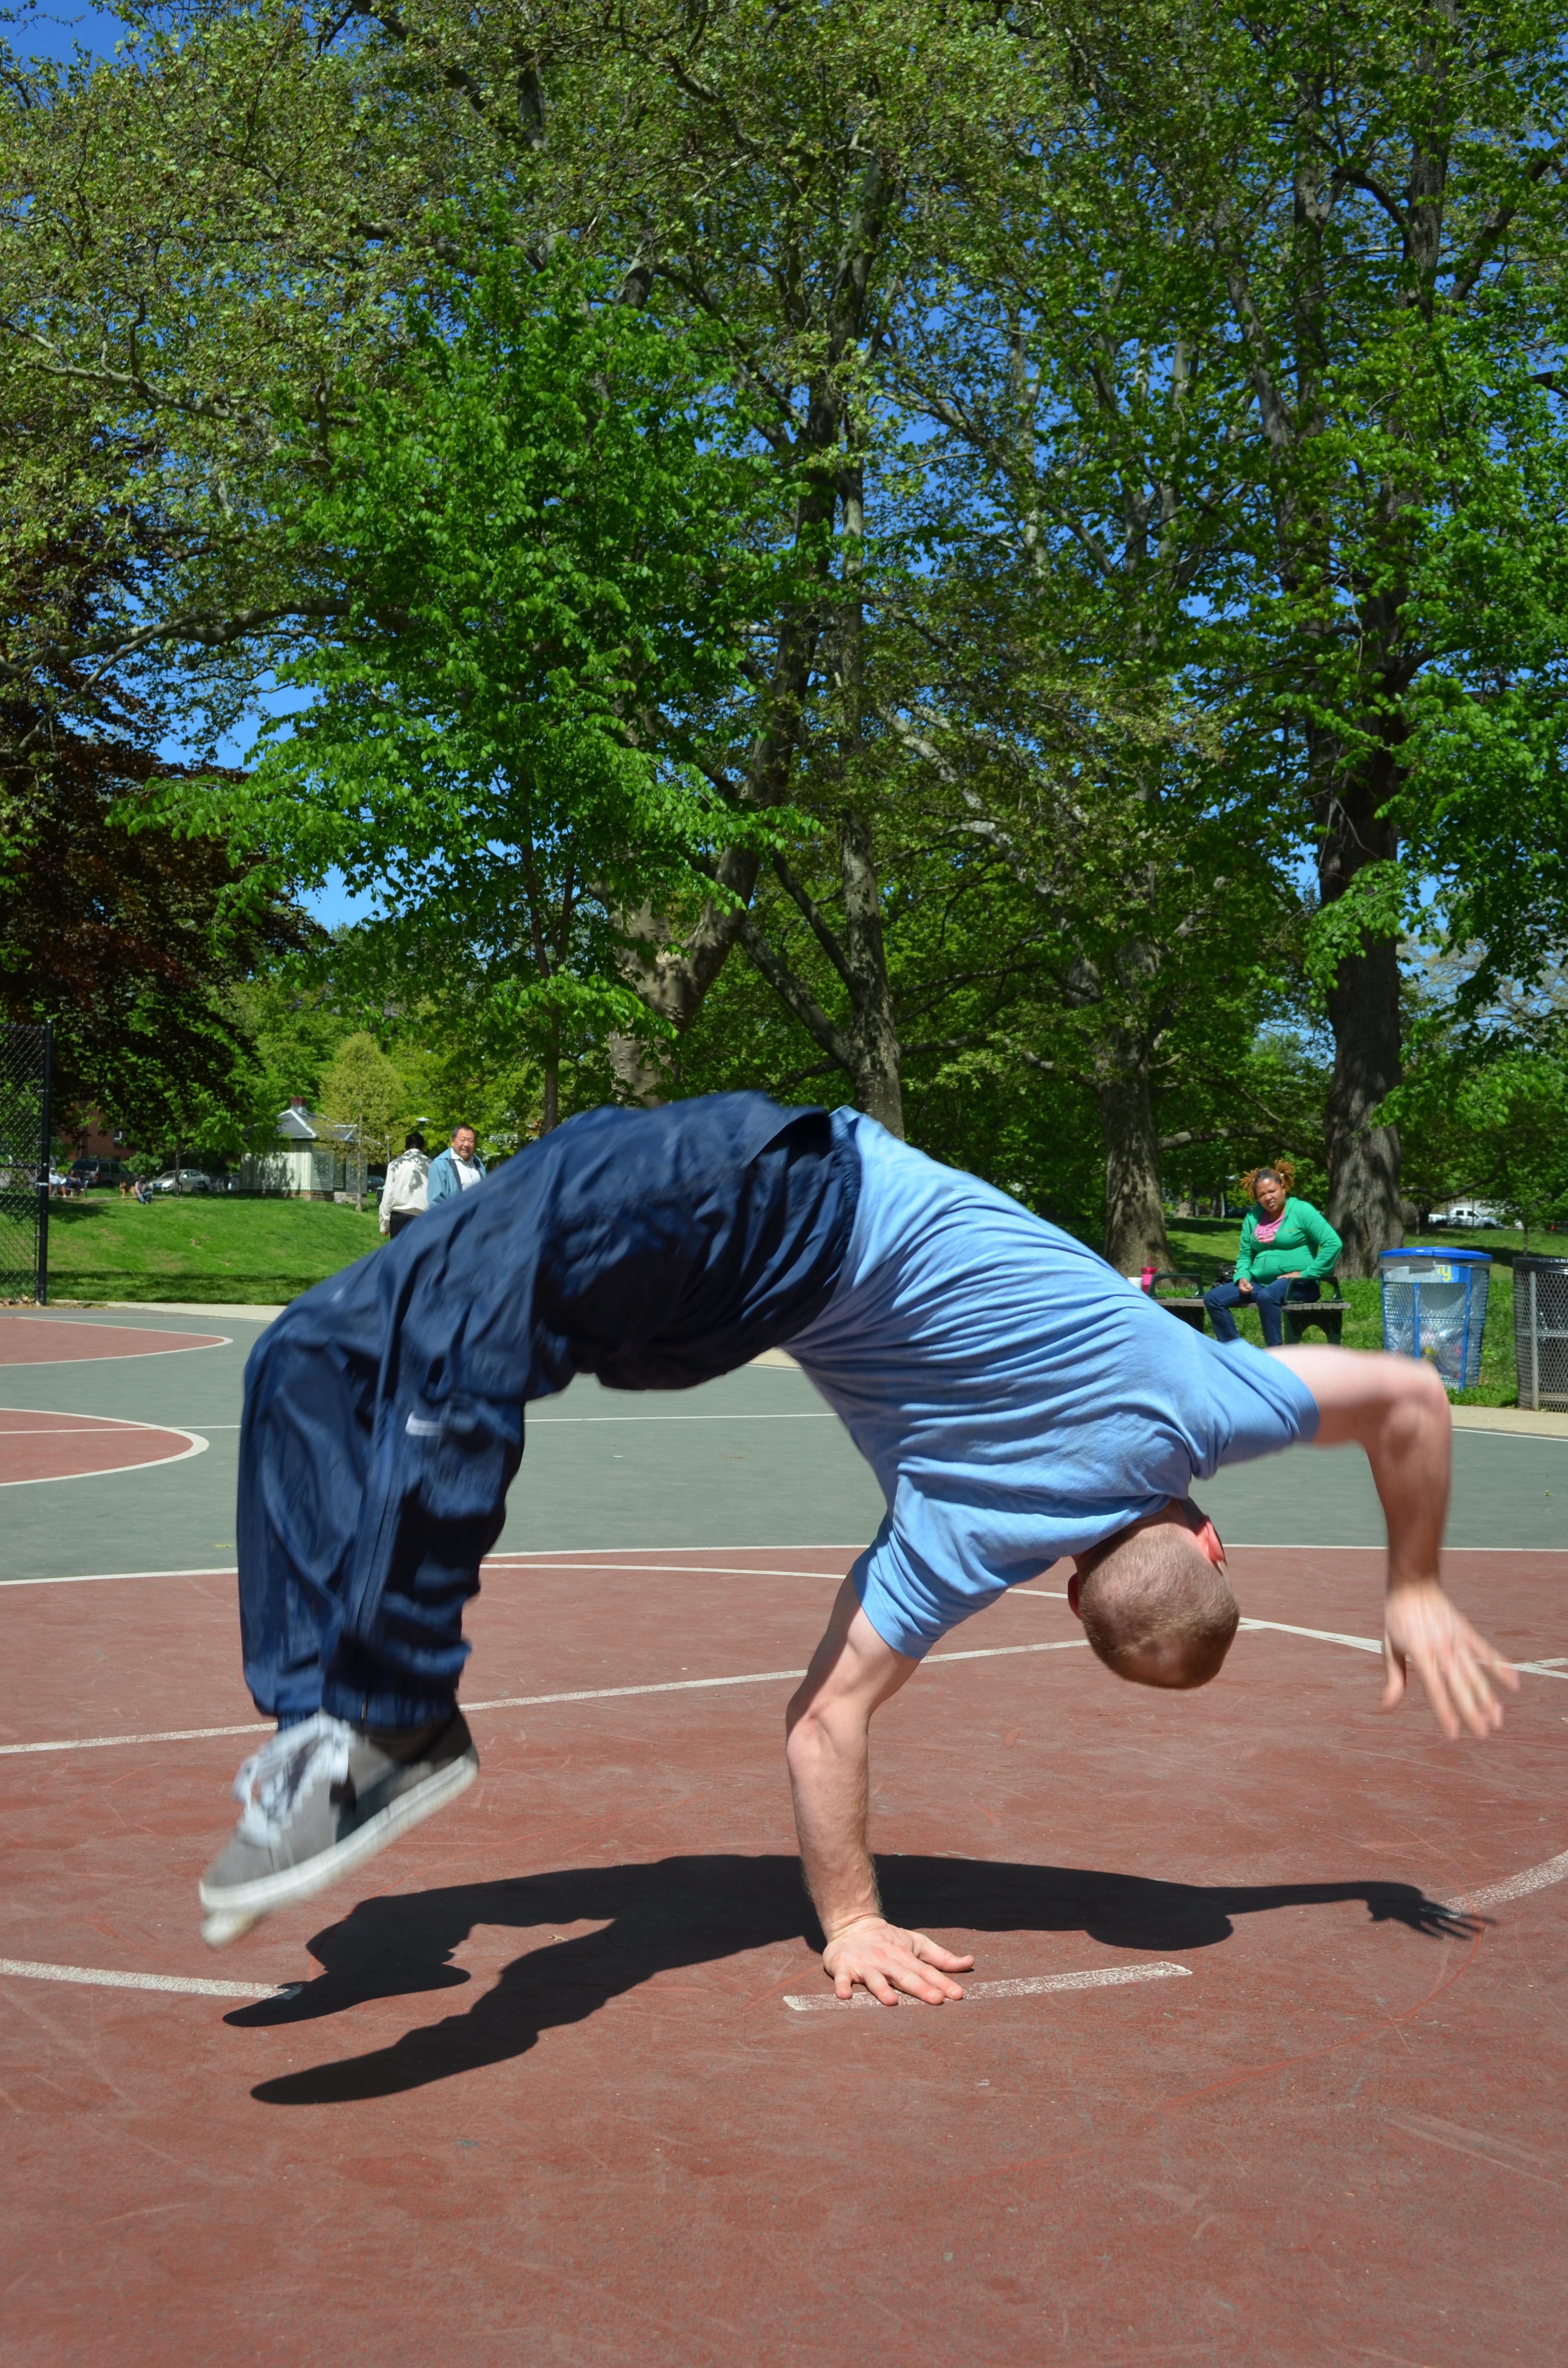 hip hop fundamentals j r blackwell hip hop fundamentals photo essay for philadelphia weekly